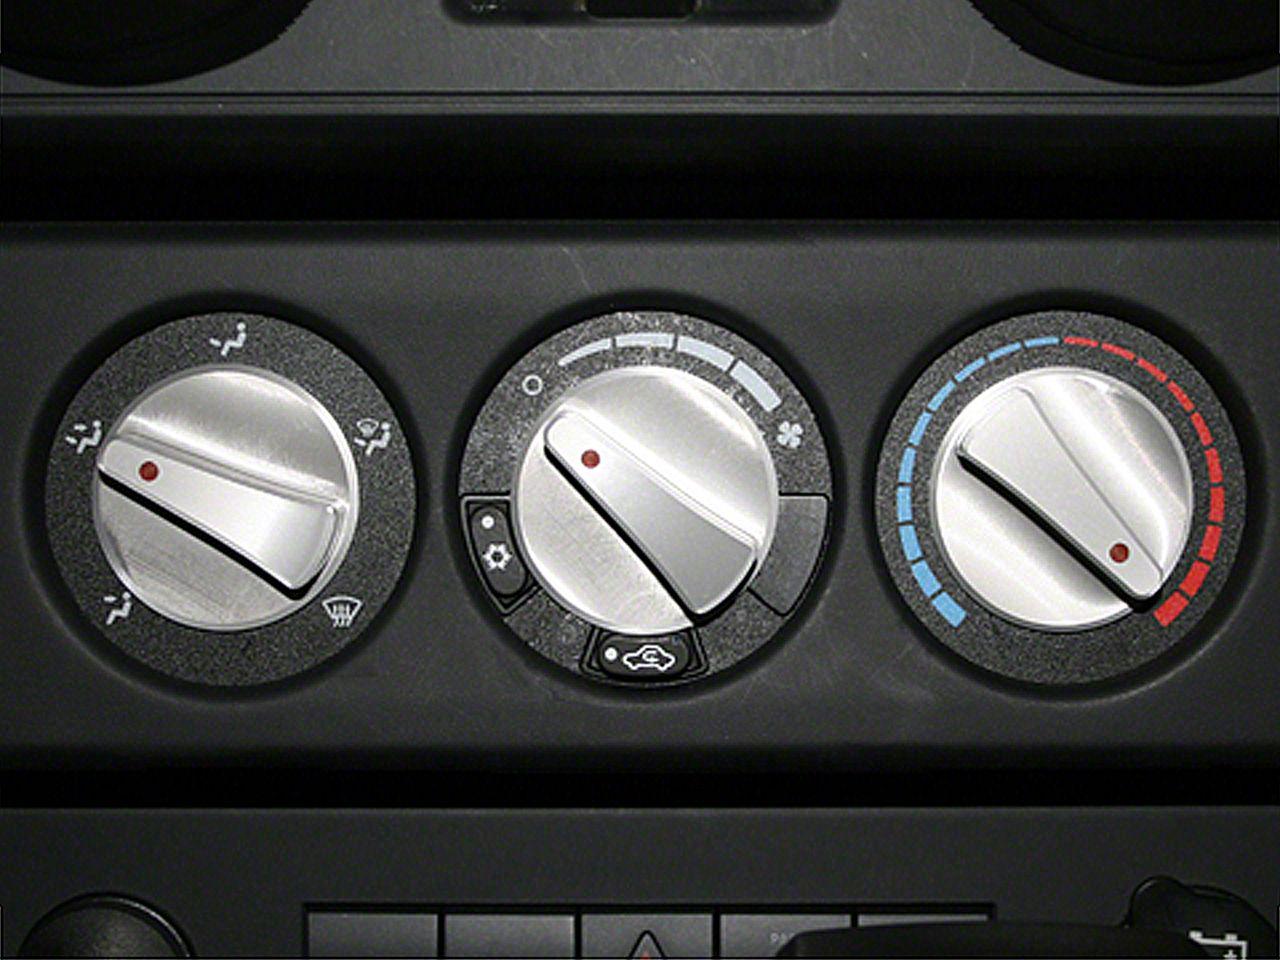 Rugged Ridge Billet Aluminum Climate Control Knob Set w/ Red Indicators (07-10 Jeep Wrangler JK)